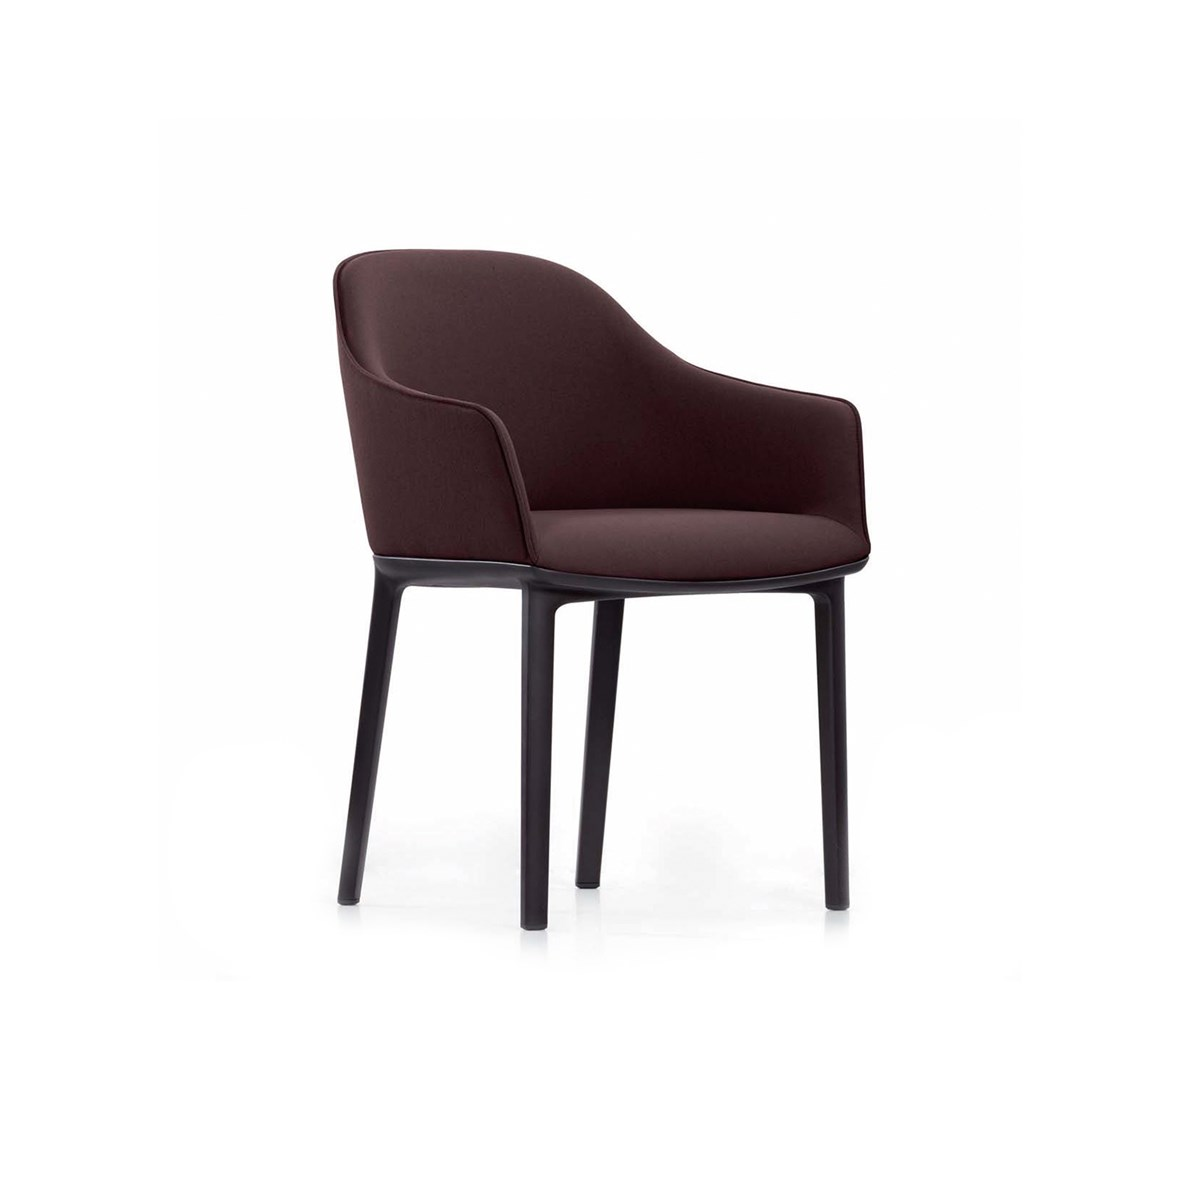 Vitra-Ronan-Erwan-Bouroullec-Softshell-Chairs-Matisse-1